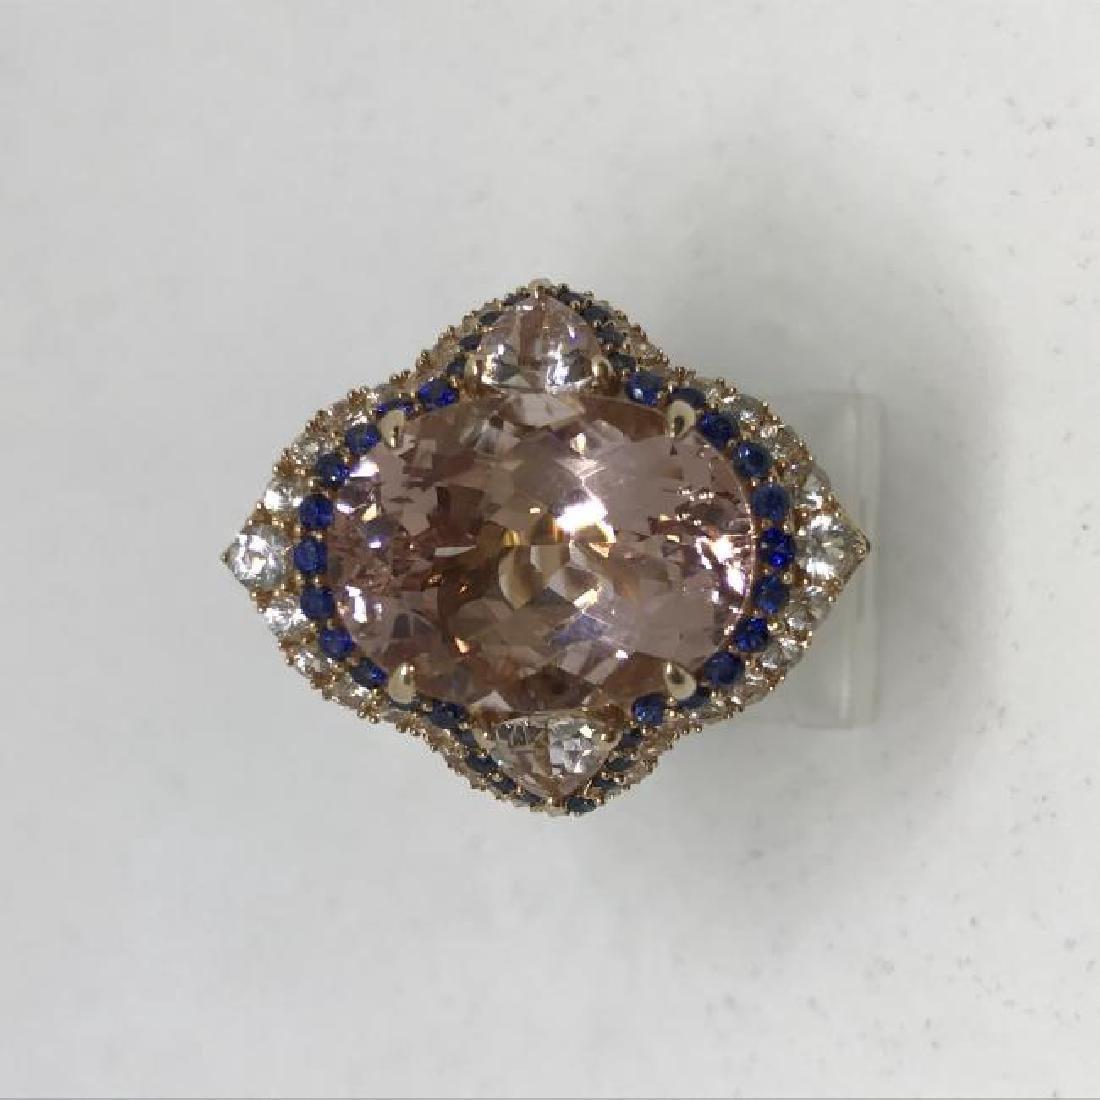 14K Rose Gold Morganite Sapphire Ring, 8.74ct